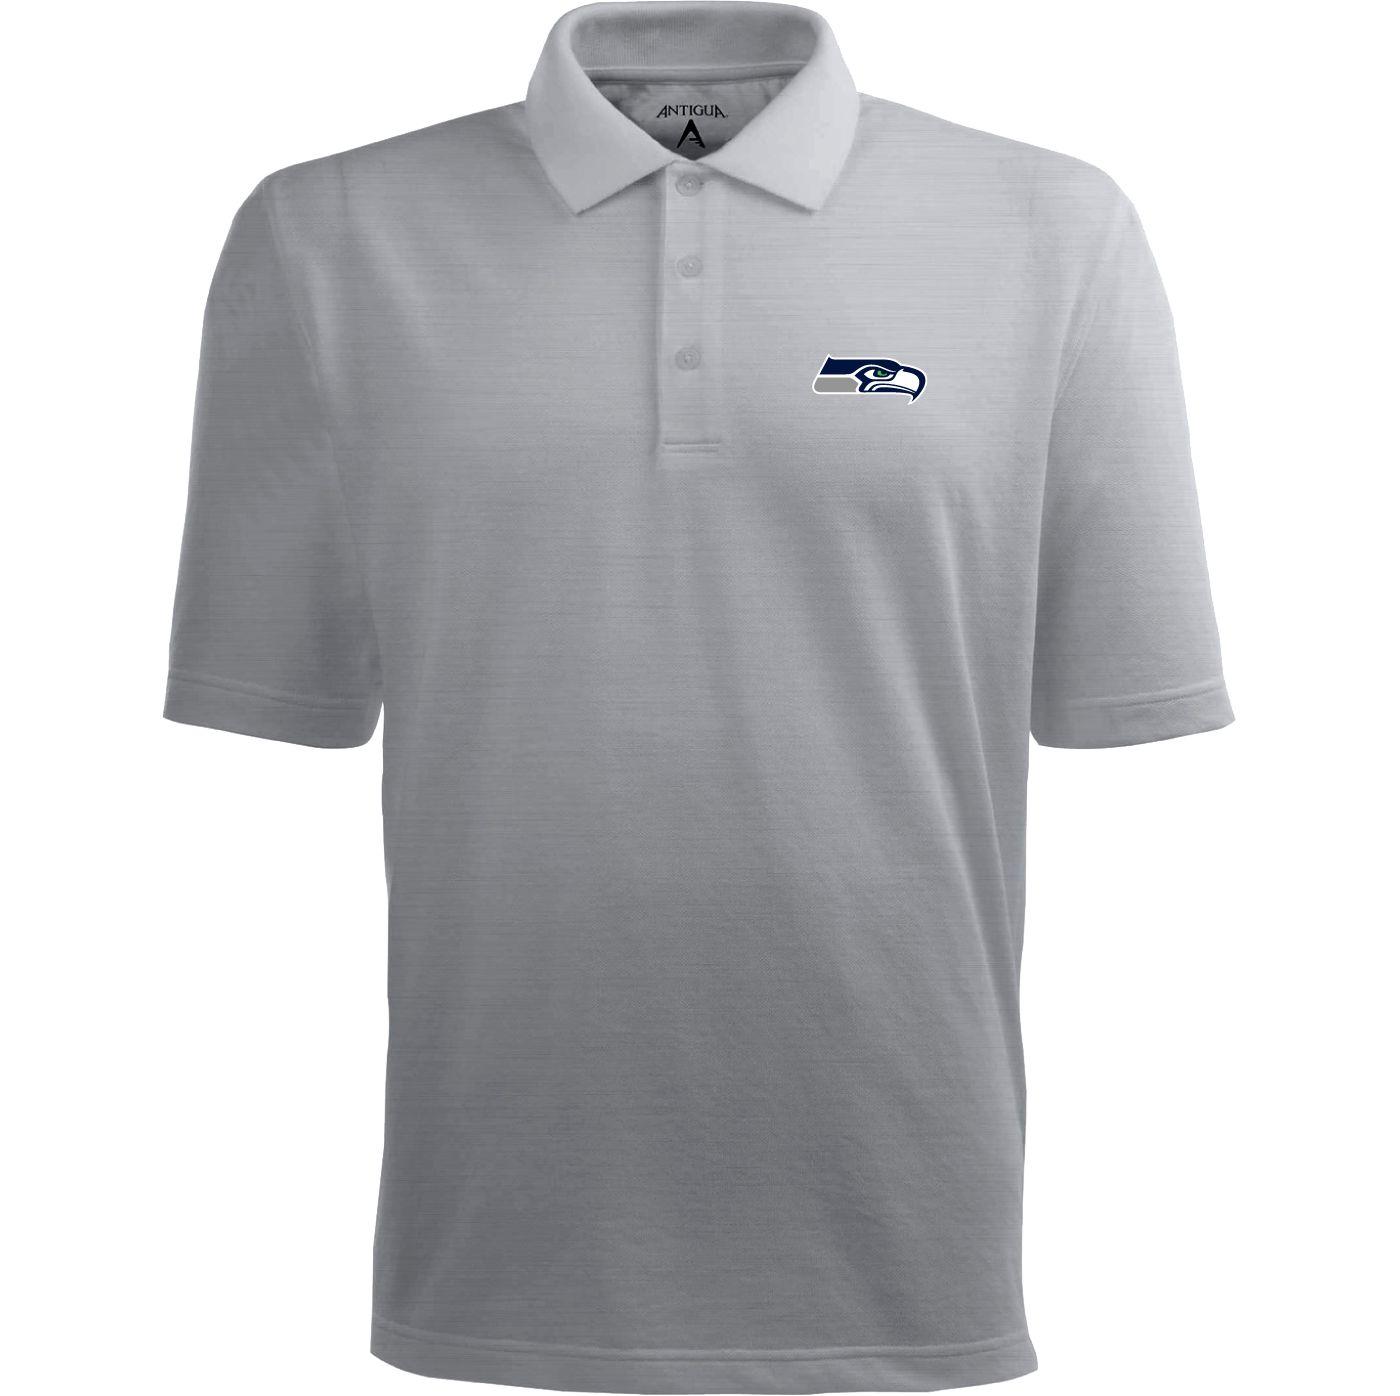 Antigua Men's Seattle Seahawks Pique Xtra-Lite Grey Polo